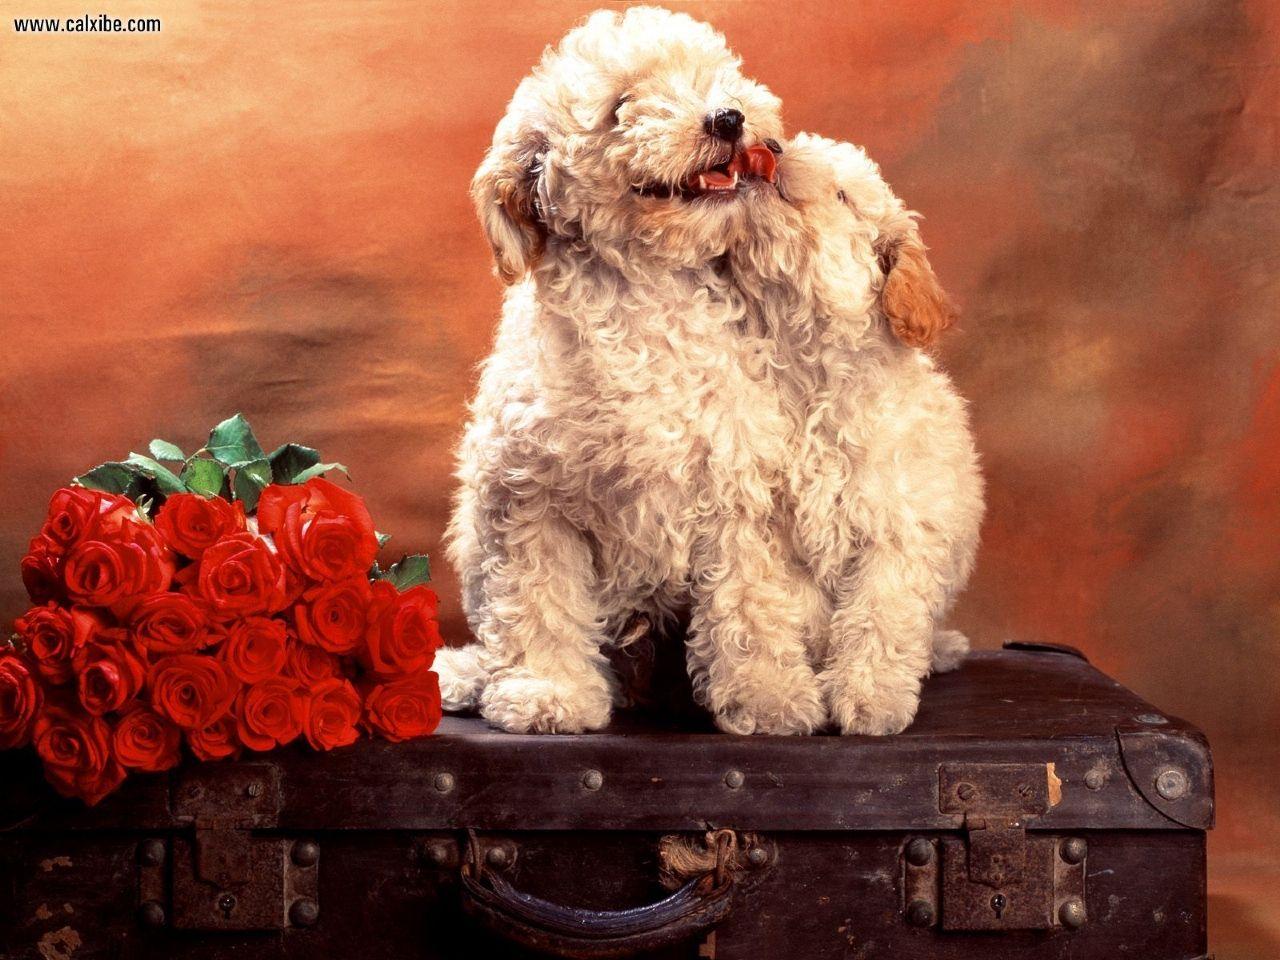 I Love Dogs Wallpaper : I Love Dogs Wallpaper - WallpaperSafari